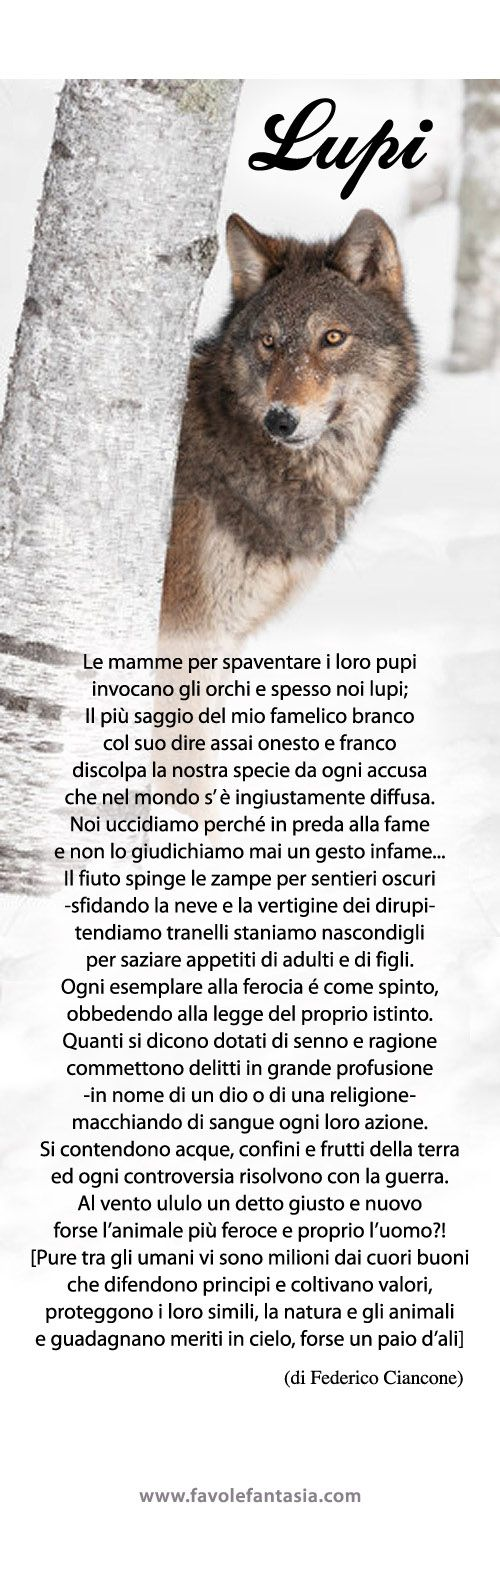 Lupi_Federico-Ciancone.jpg (500×1575)